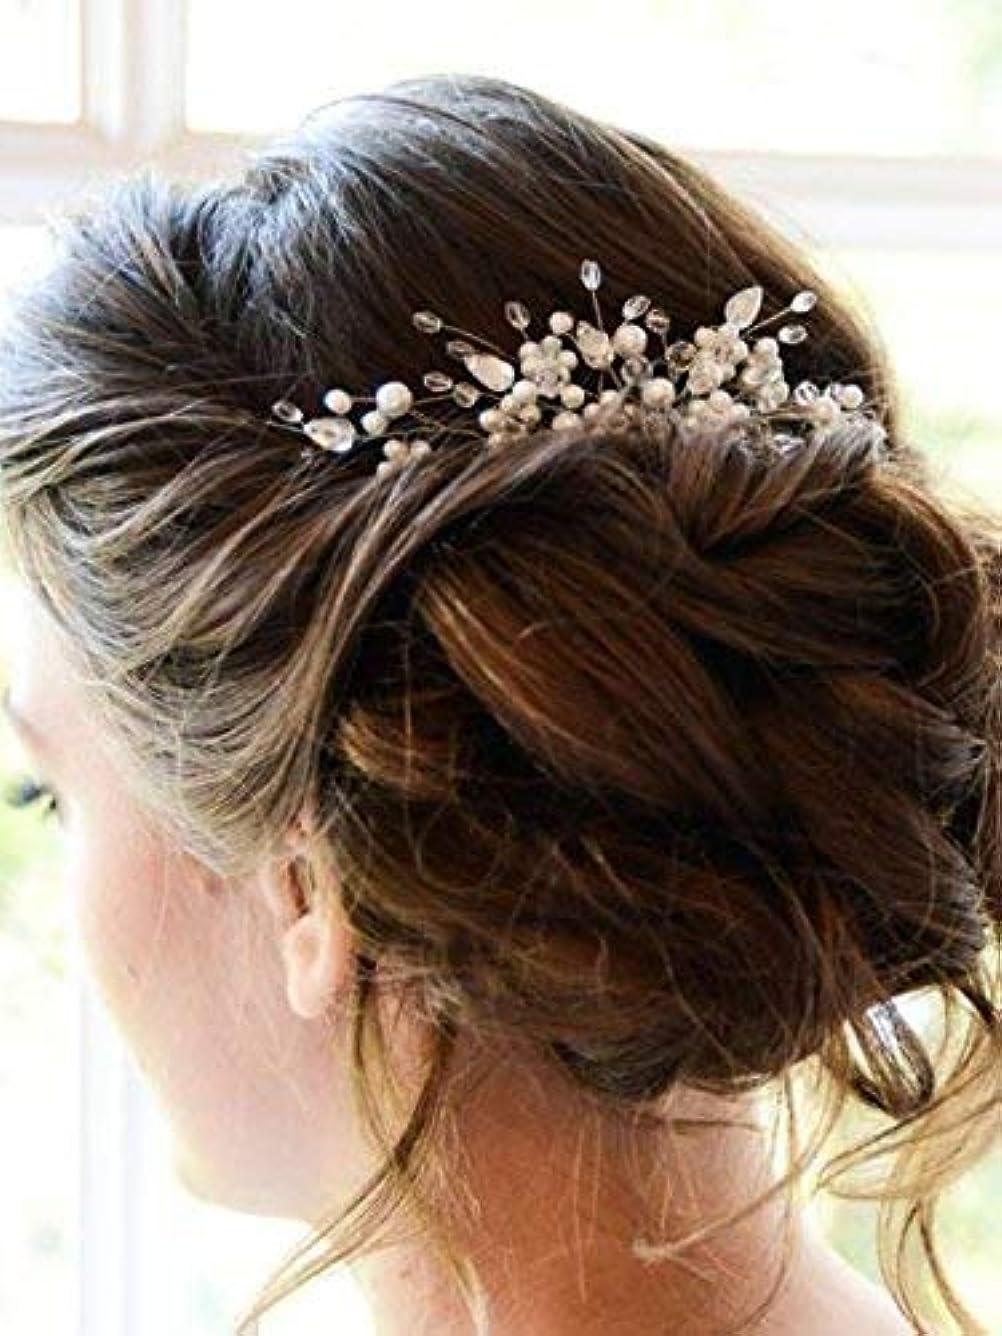 農学入浴疑いMissgrace Bridal Vintage Hair Comb Bridal Headpiece Bridal Hair Piece Wedding Hair Piece Wedding Headpiece Wedding...